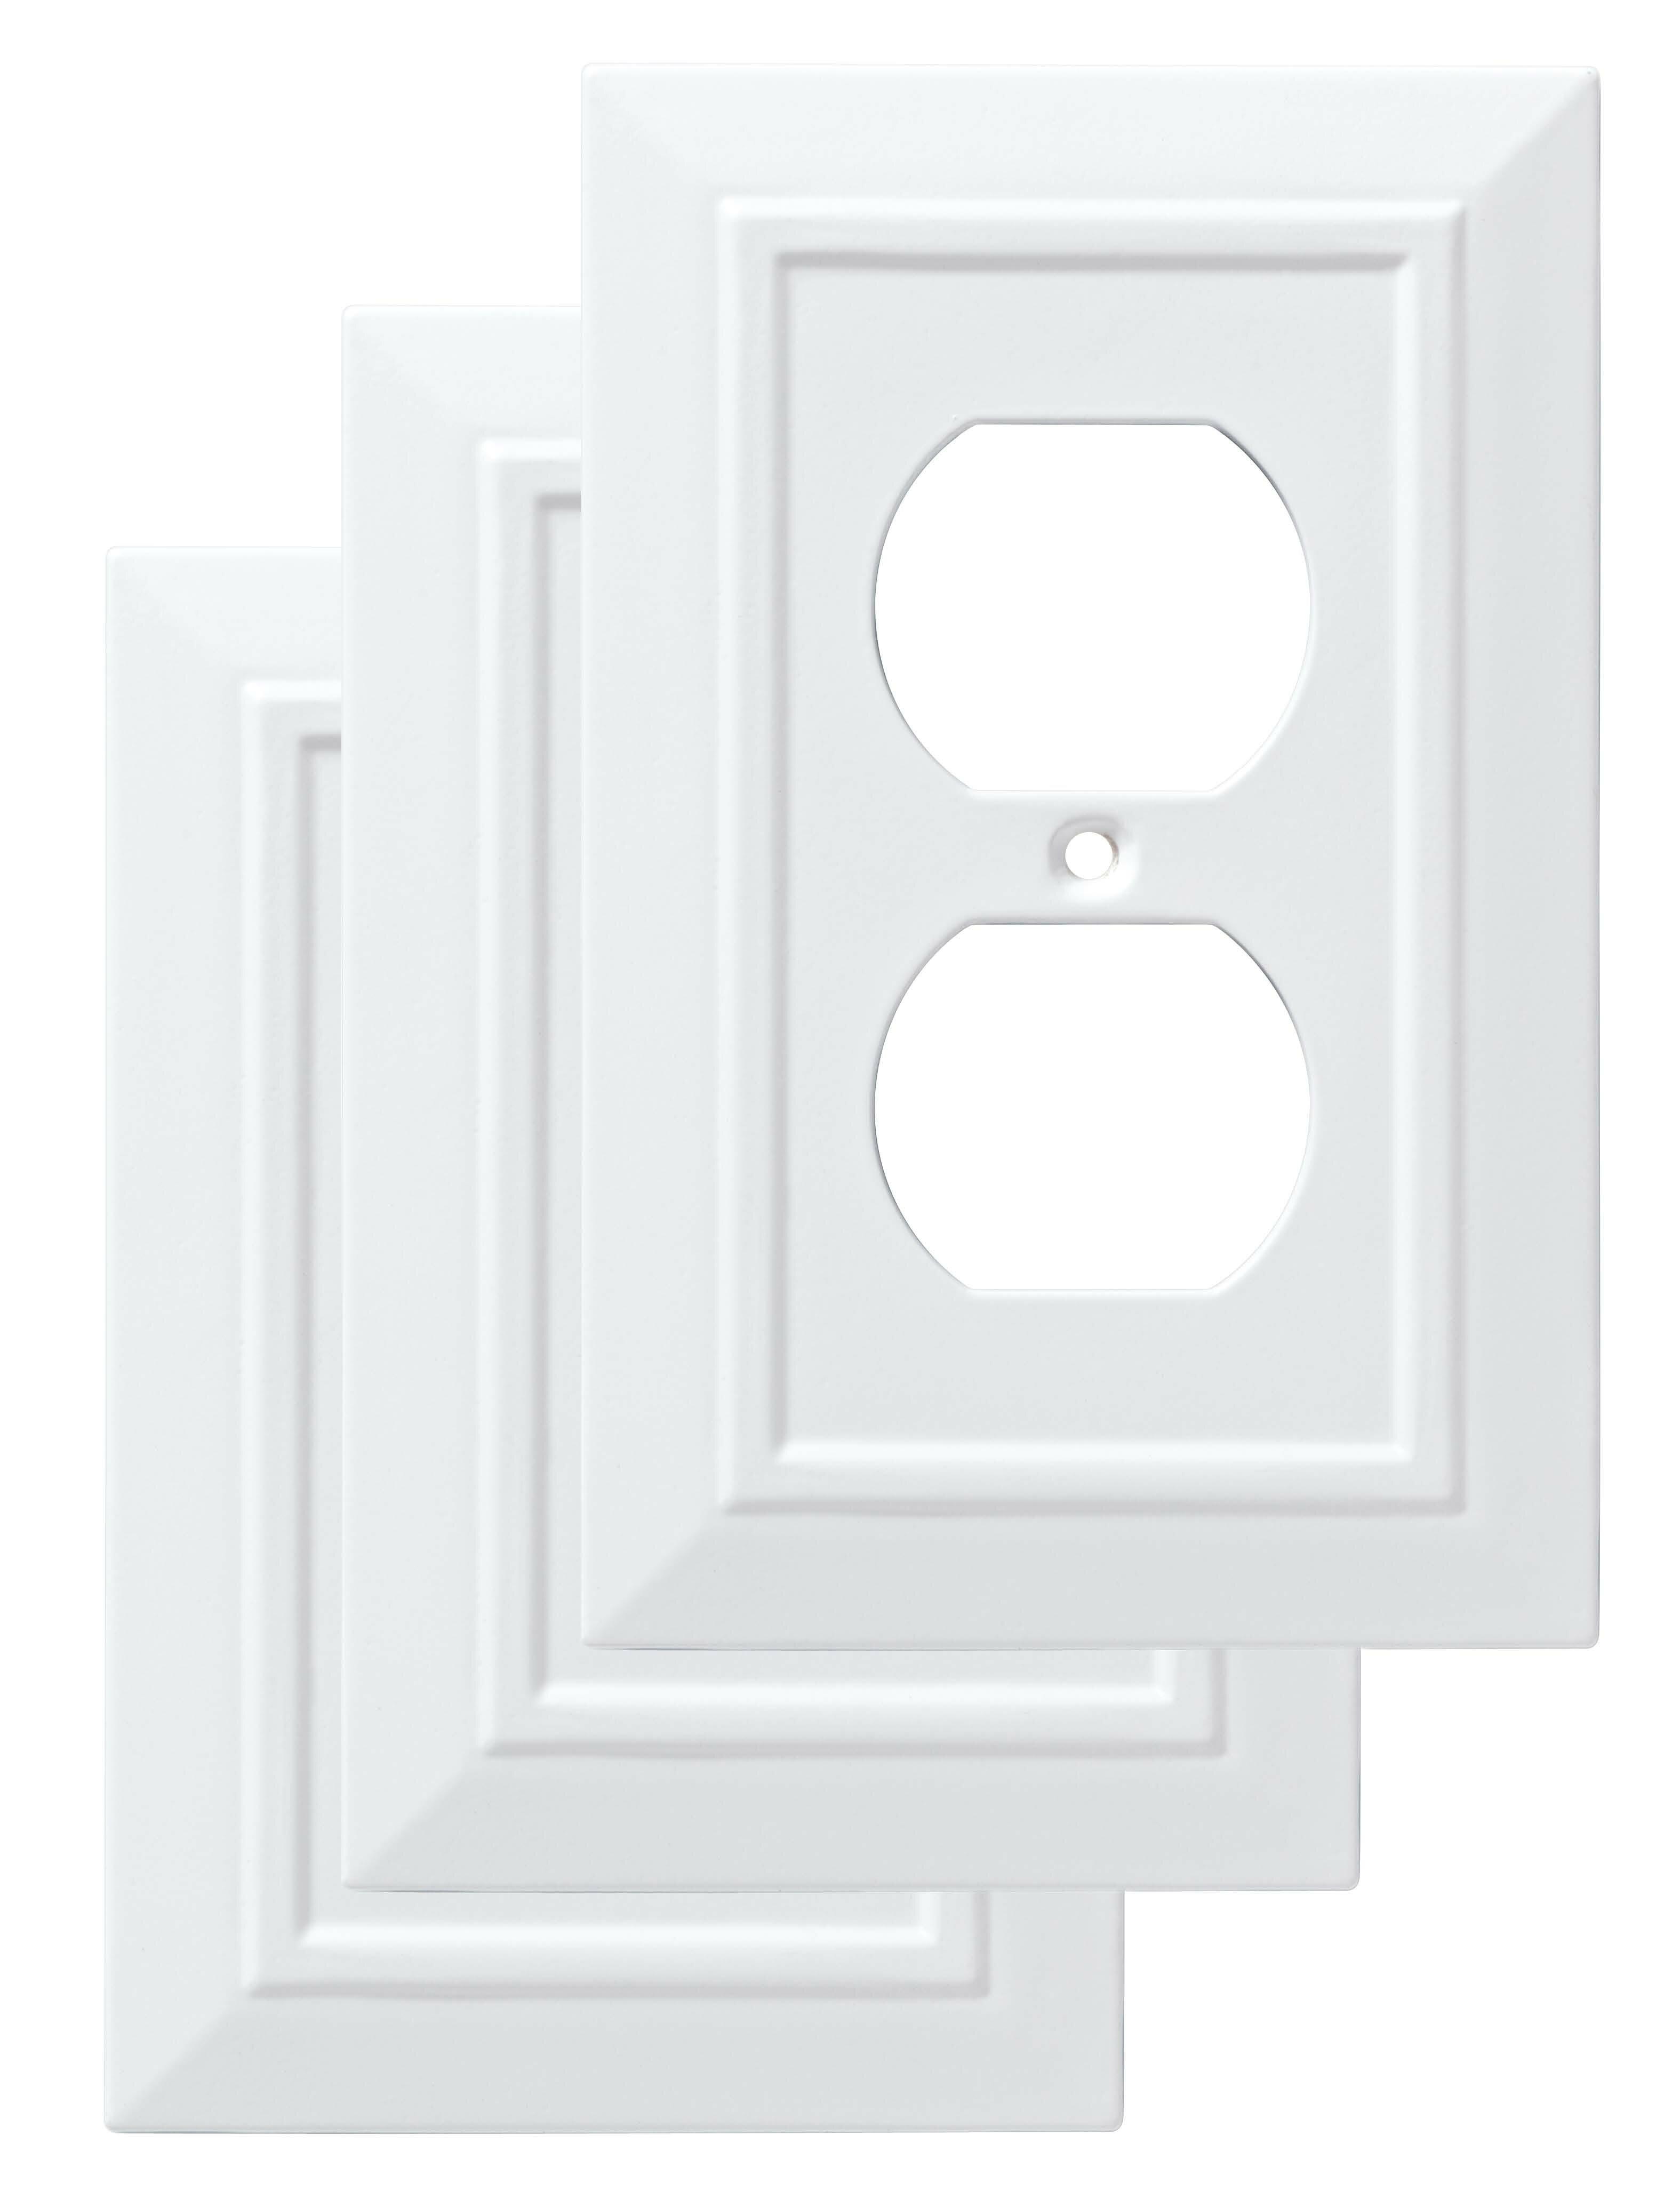 Franklin Brass Classic Architecture 1 Gang Duplex Outlet Wall Plate Reviews Wayfair